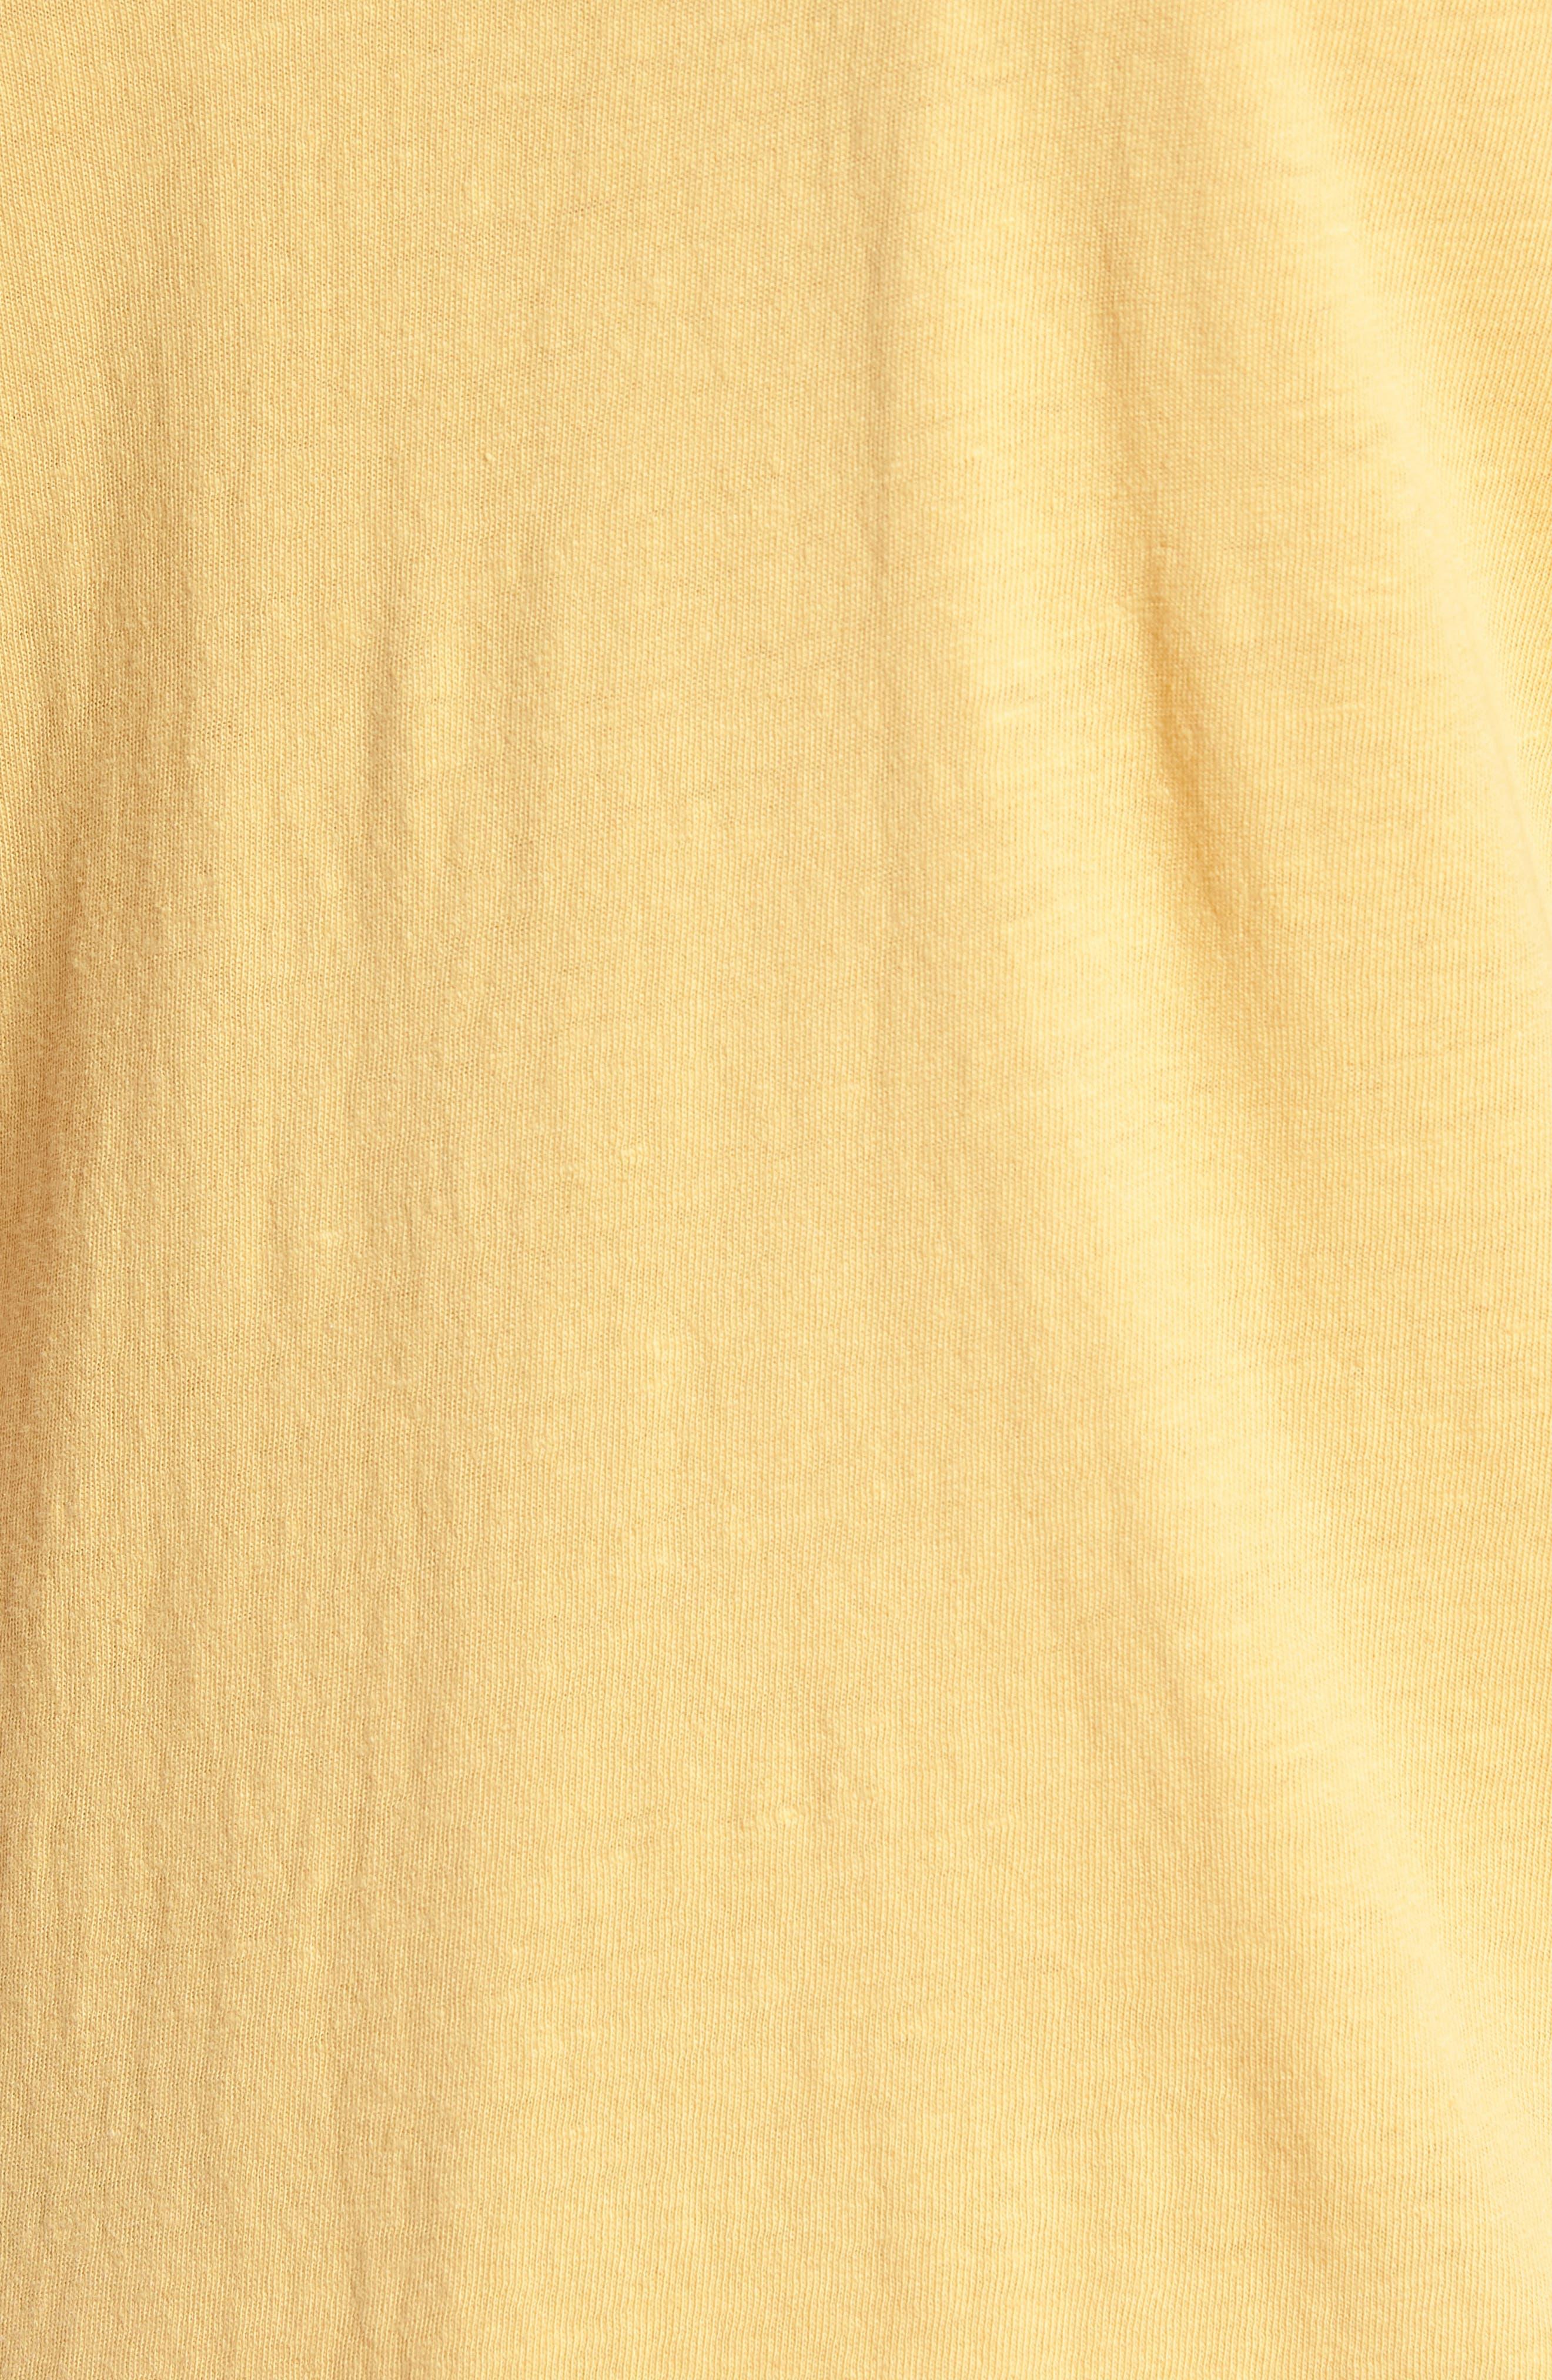 Ramsey Slim Fit Crewneck T-Shirt,                             Alternate thumbnail 5, color,                             Weathered Golden Emmer